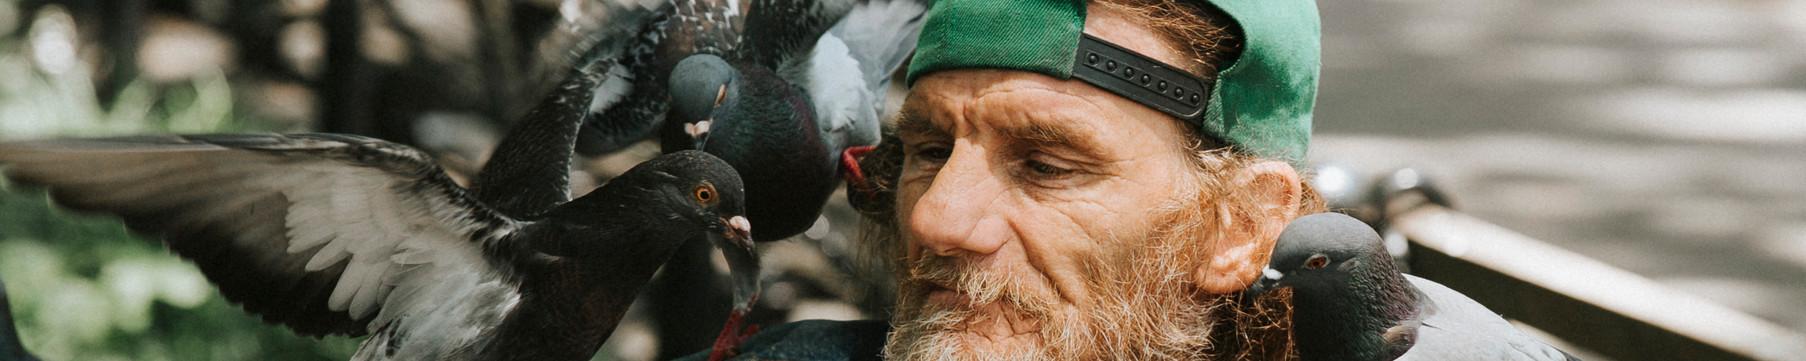 Harry the Birdman